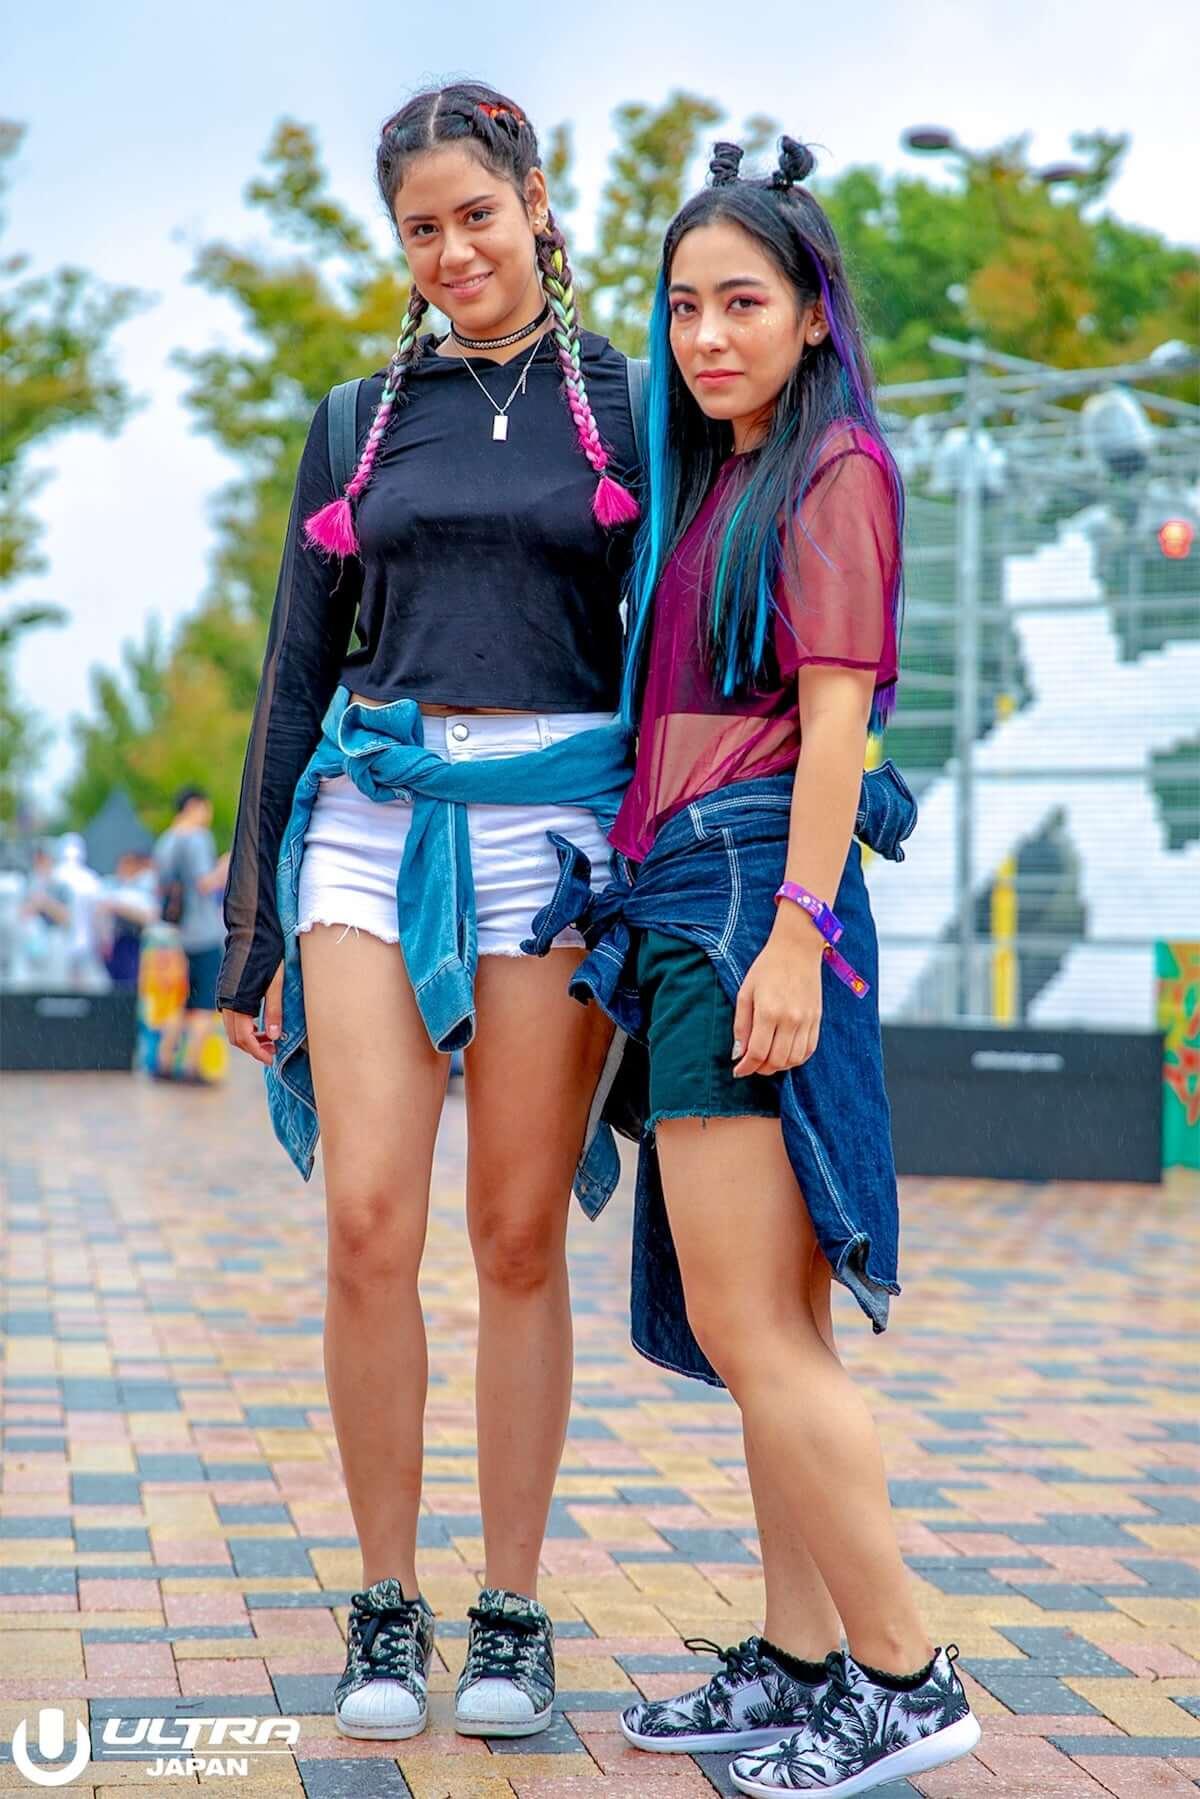 ULTRA JAPAN 2018公式ファッションスナップ到着!今年のトレンドはリンクコーデ? music180918_ultrajapan2018_1_1-1200x1799